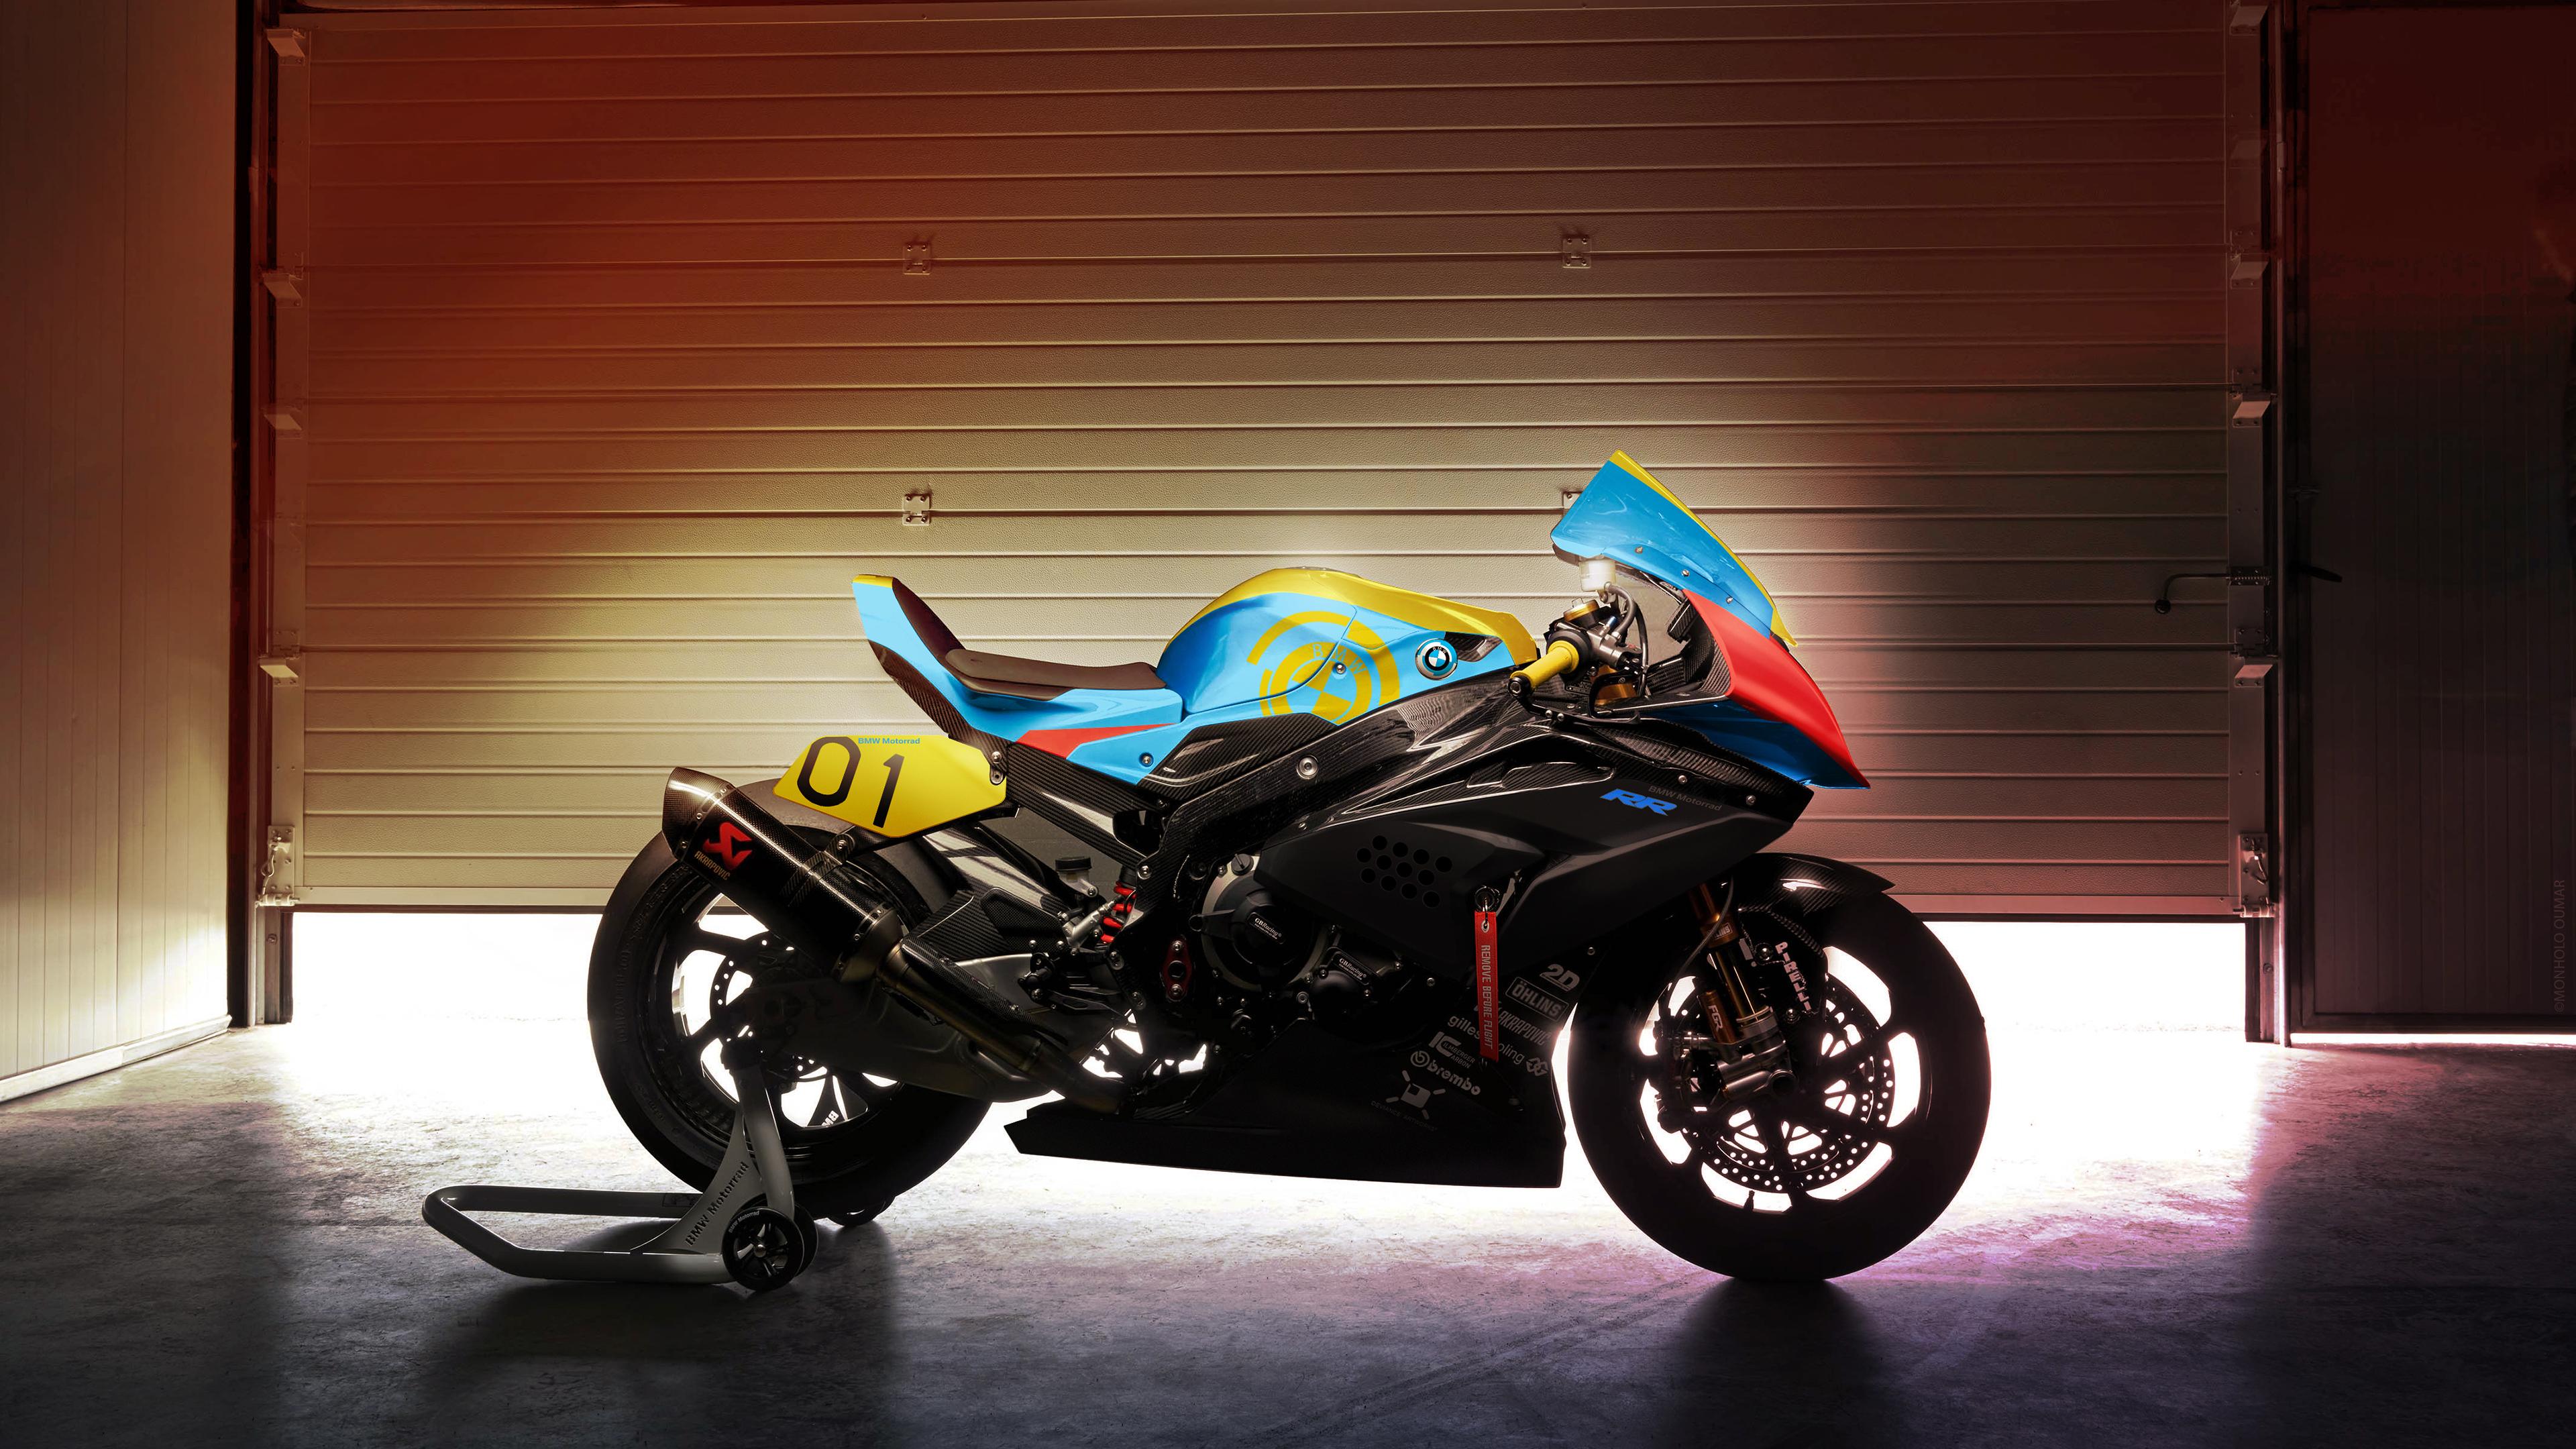 bmw motorrad 4k 1541295681 - BMW Motorrad 4k - hd-wallpapers, bmw wallpapers, bikes wallpapers, behance wallpapers, 4k-wallpapers